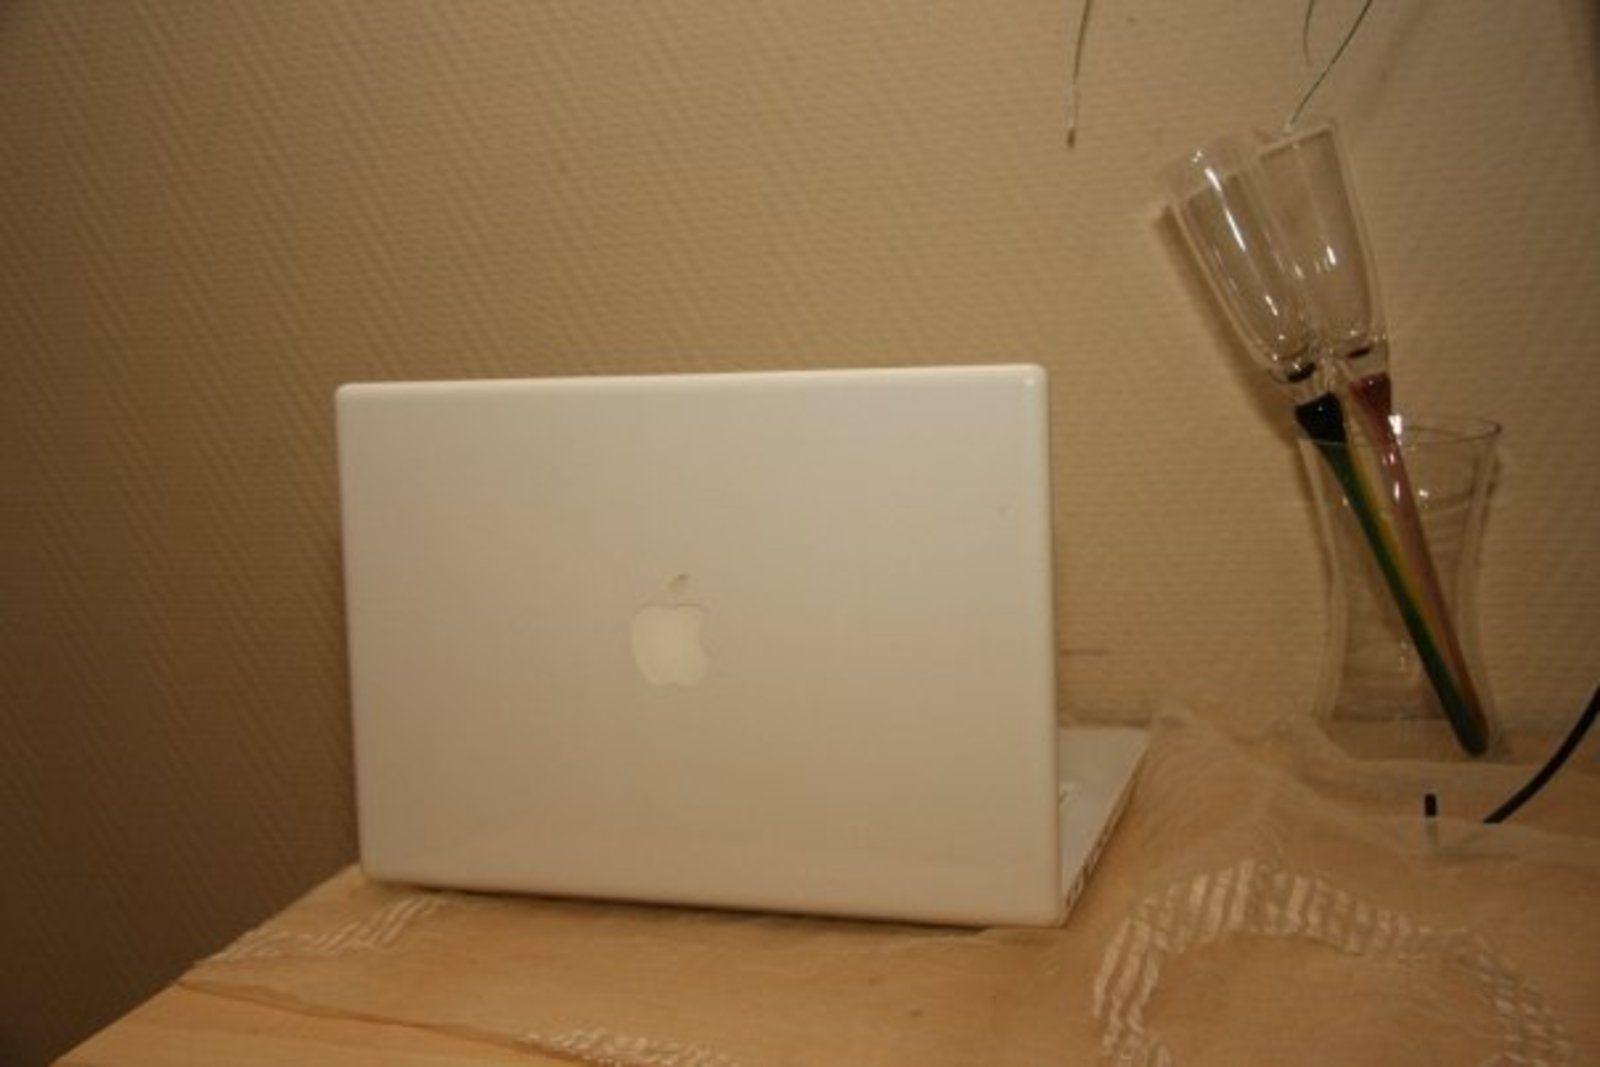 apple macbook 2 13 ghz 13 pouces image 25981 audiofanzine